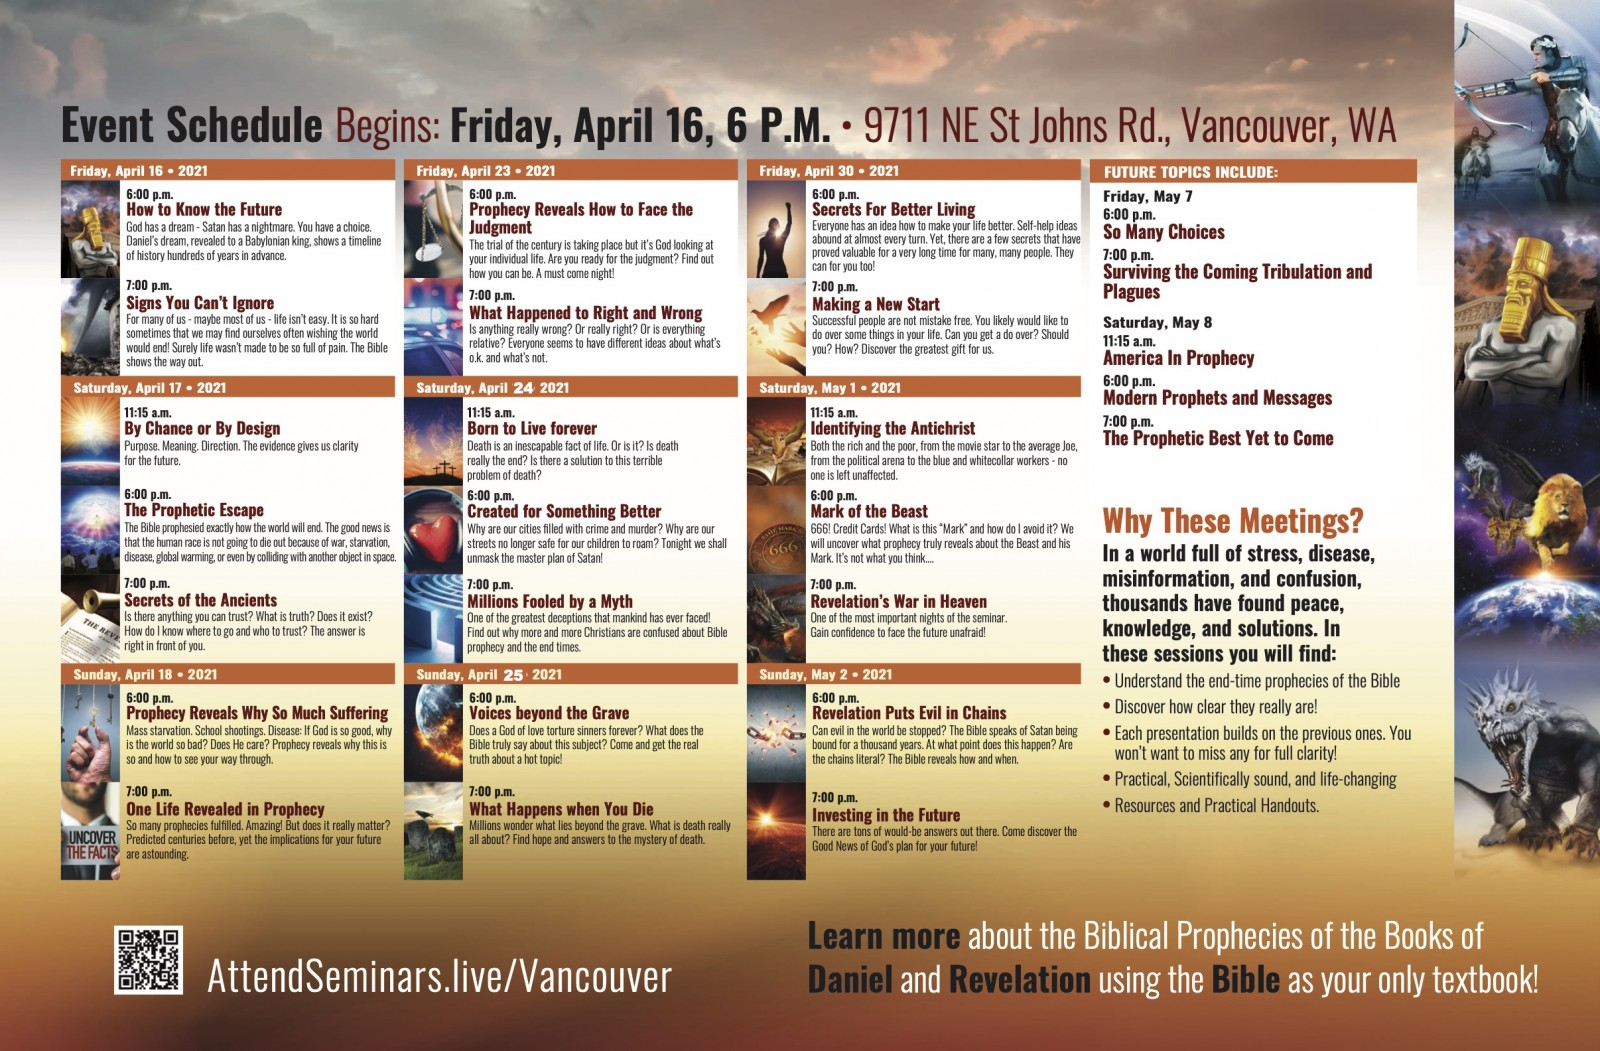 H21010 HB VancouverWA_Roger Walter p4 copy